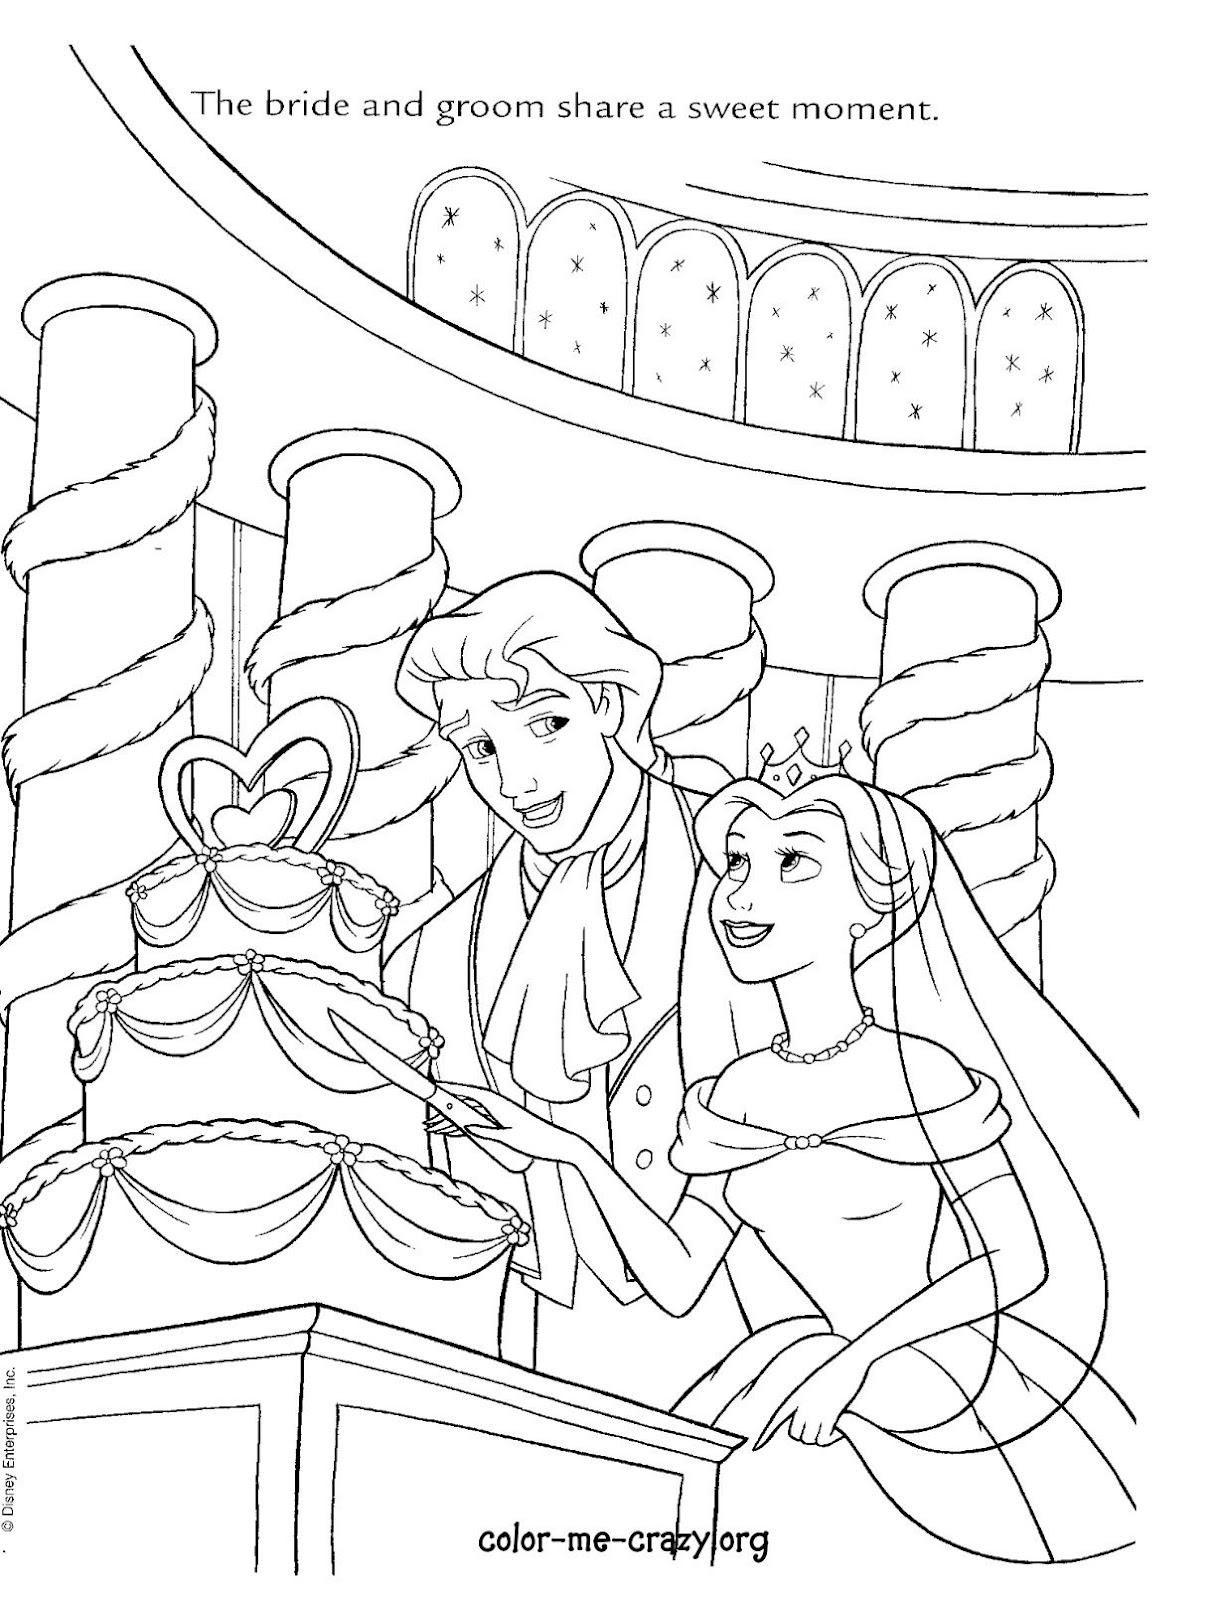 Coloring Pages Disney Princess Wedding